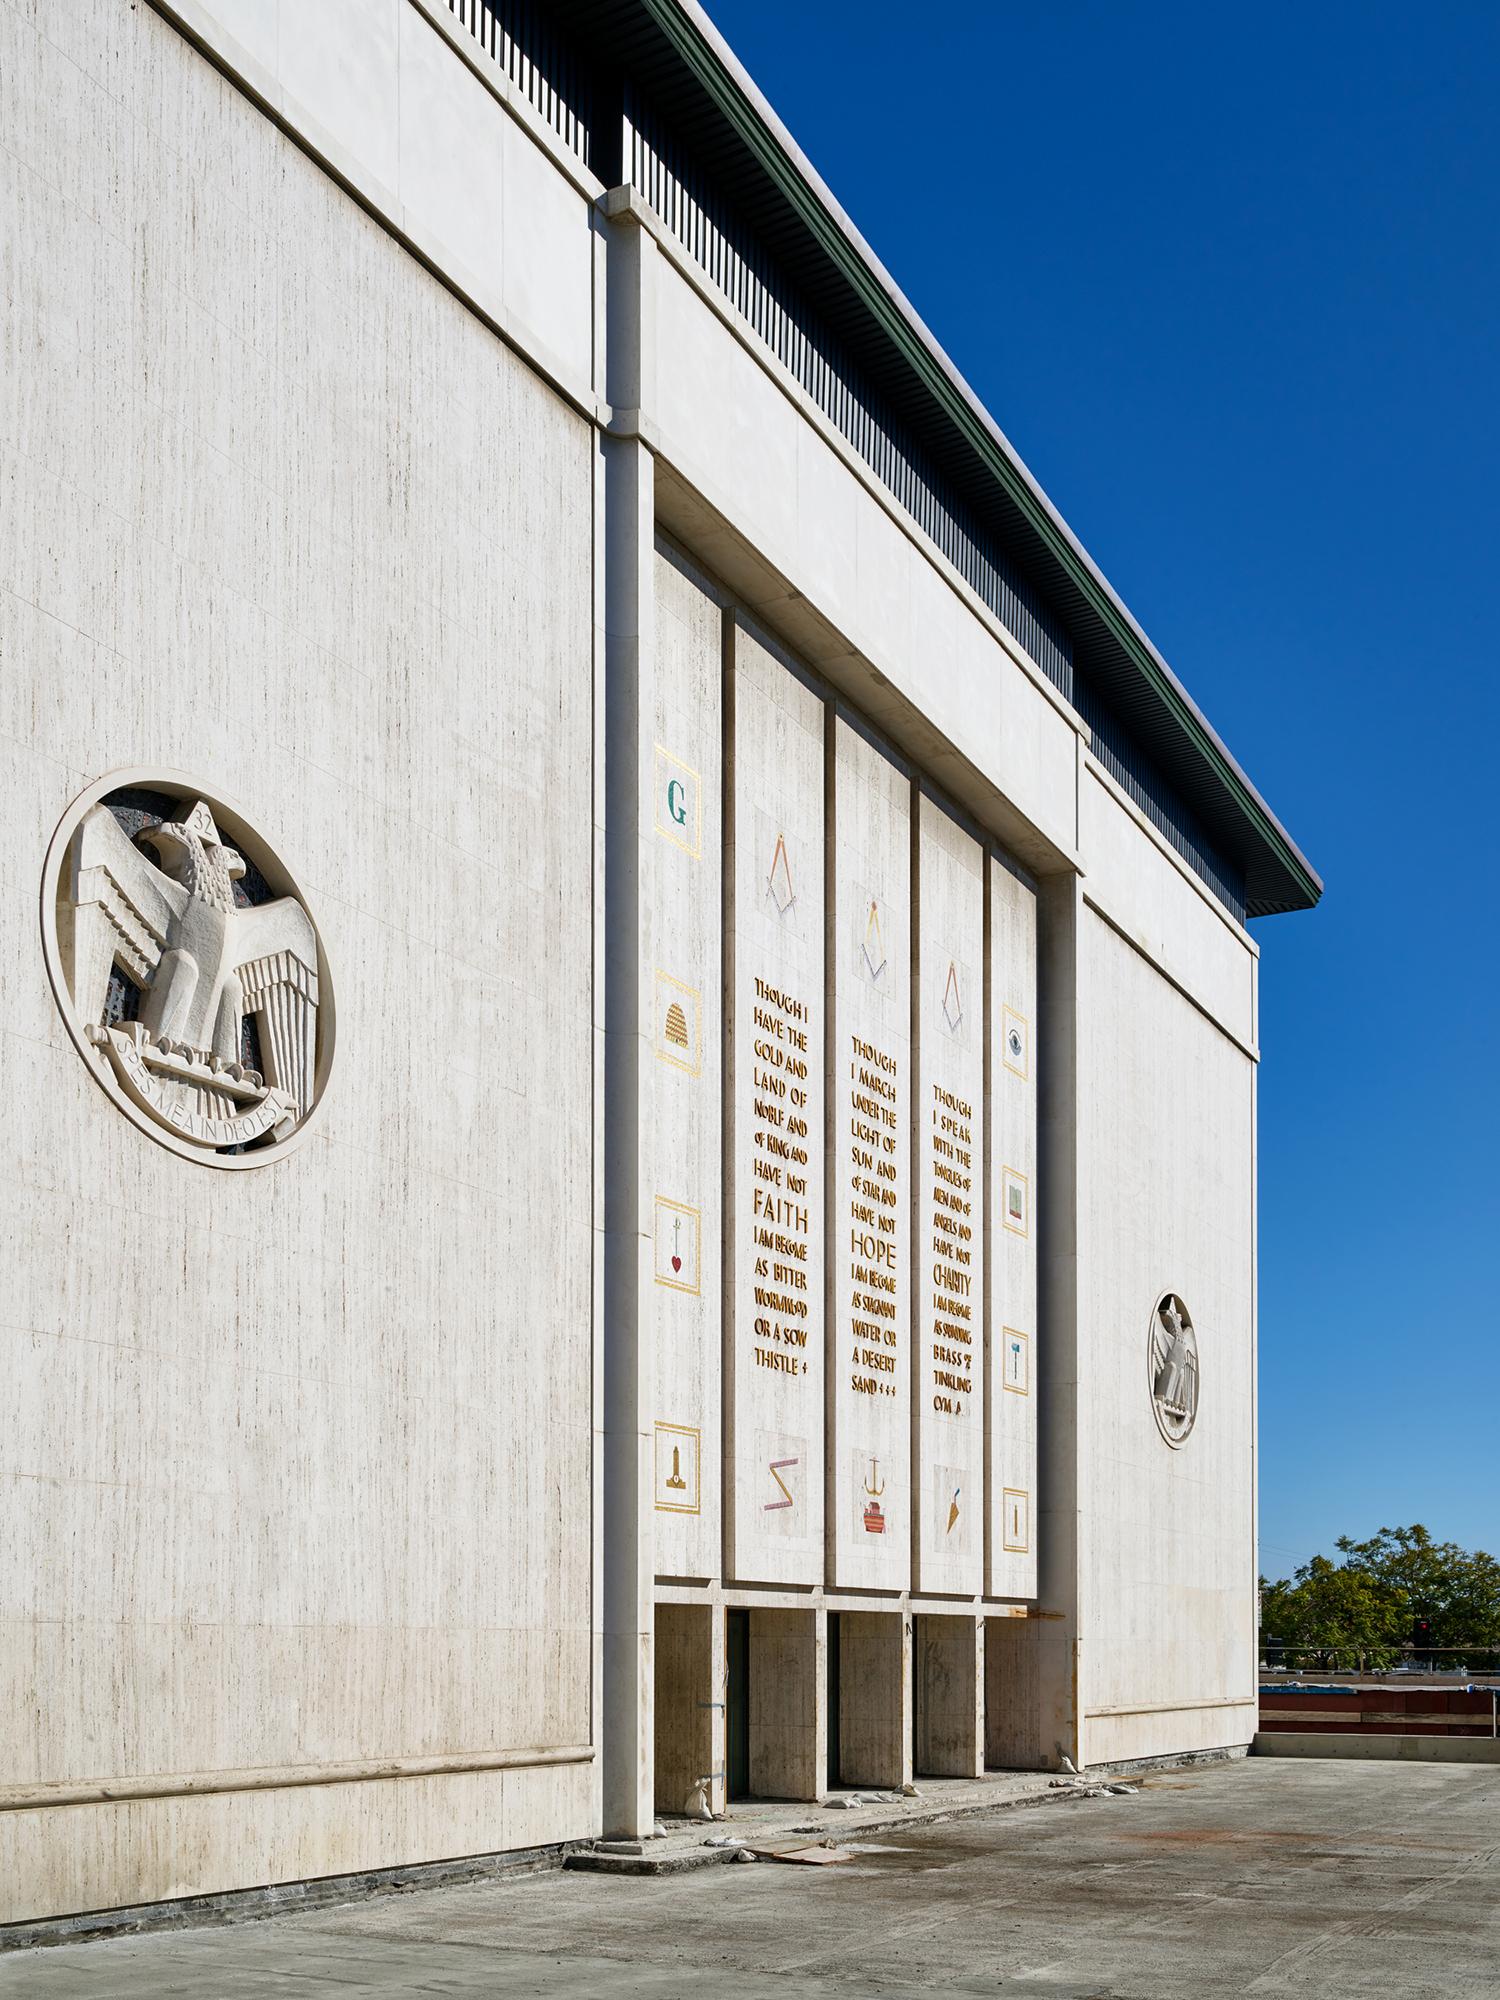 The Marciano Art Foundation, Los Angeles, California, 2016